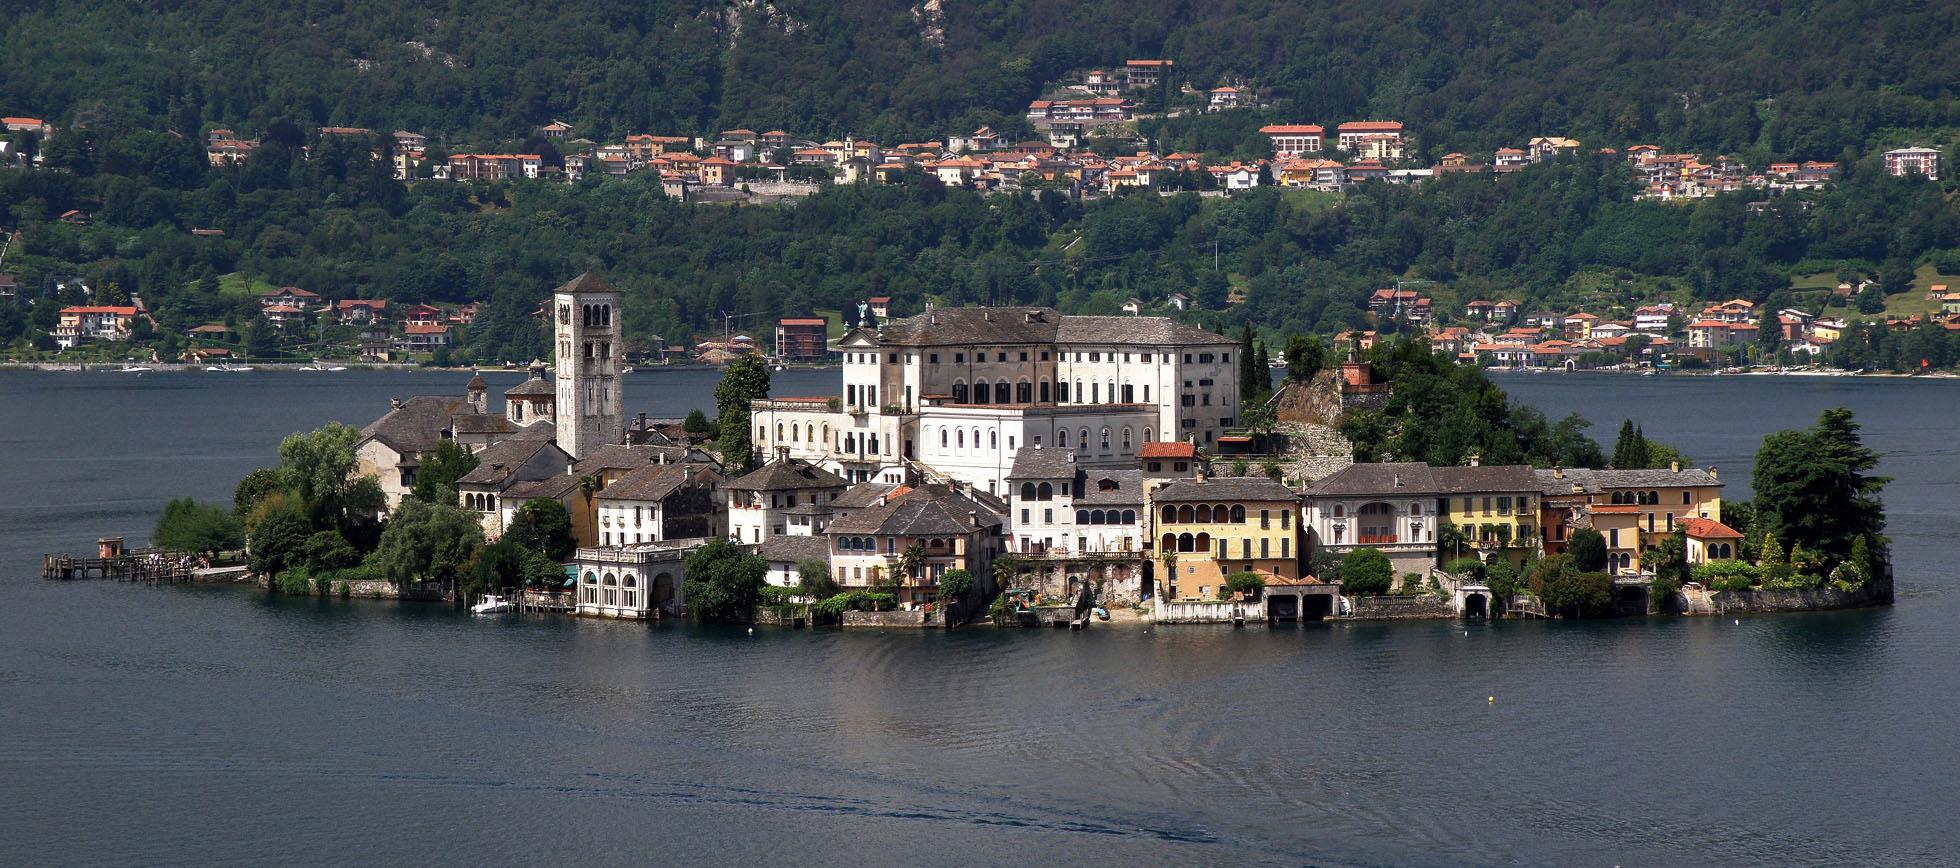 Orta_Isola_San_Giulio_rid